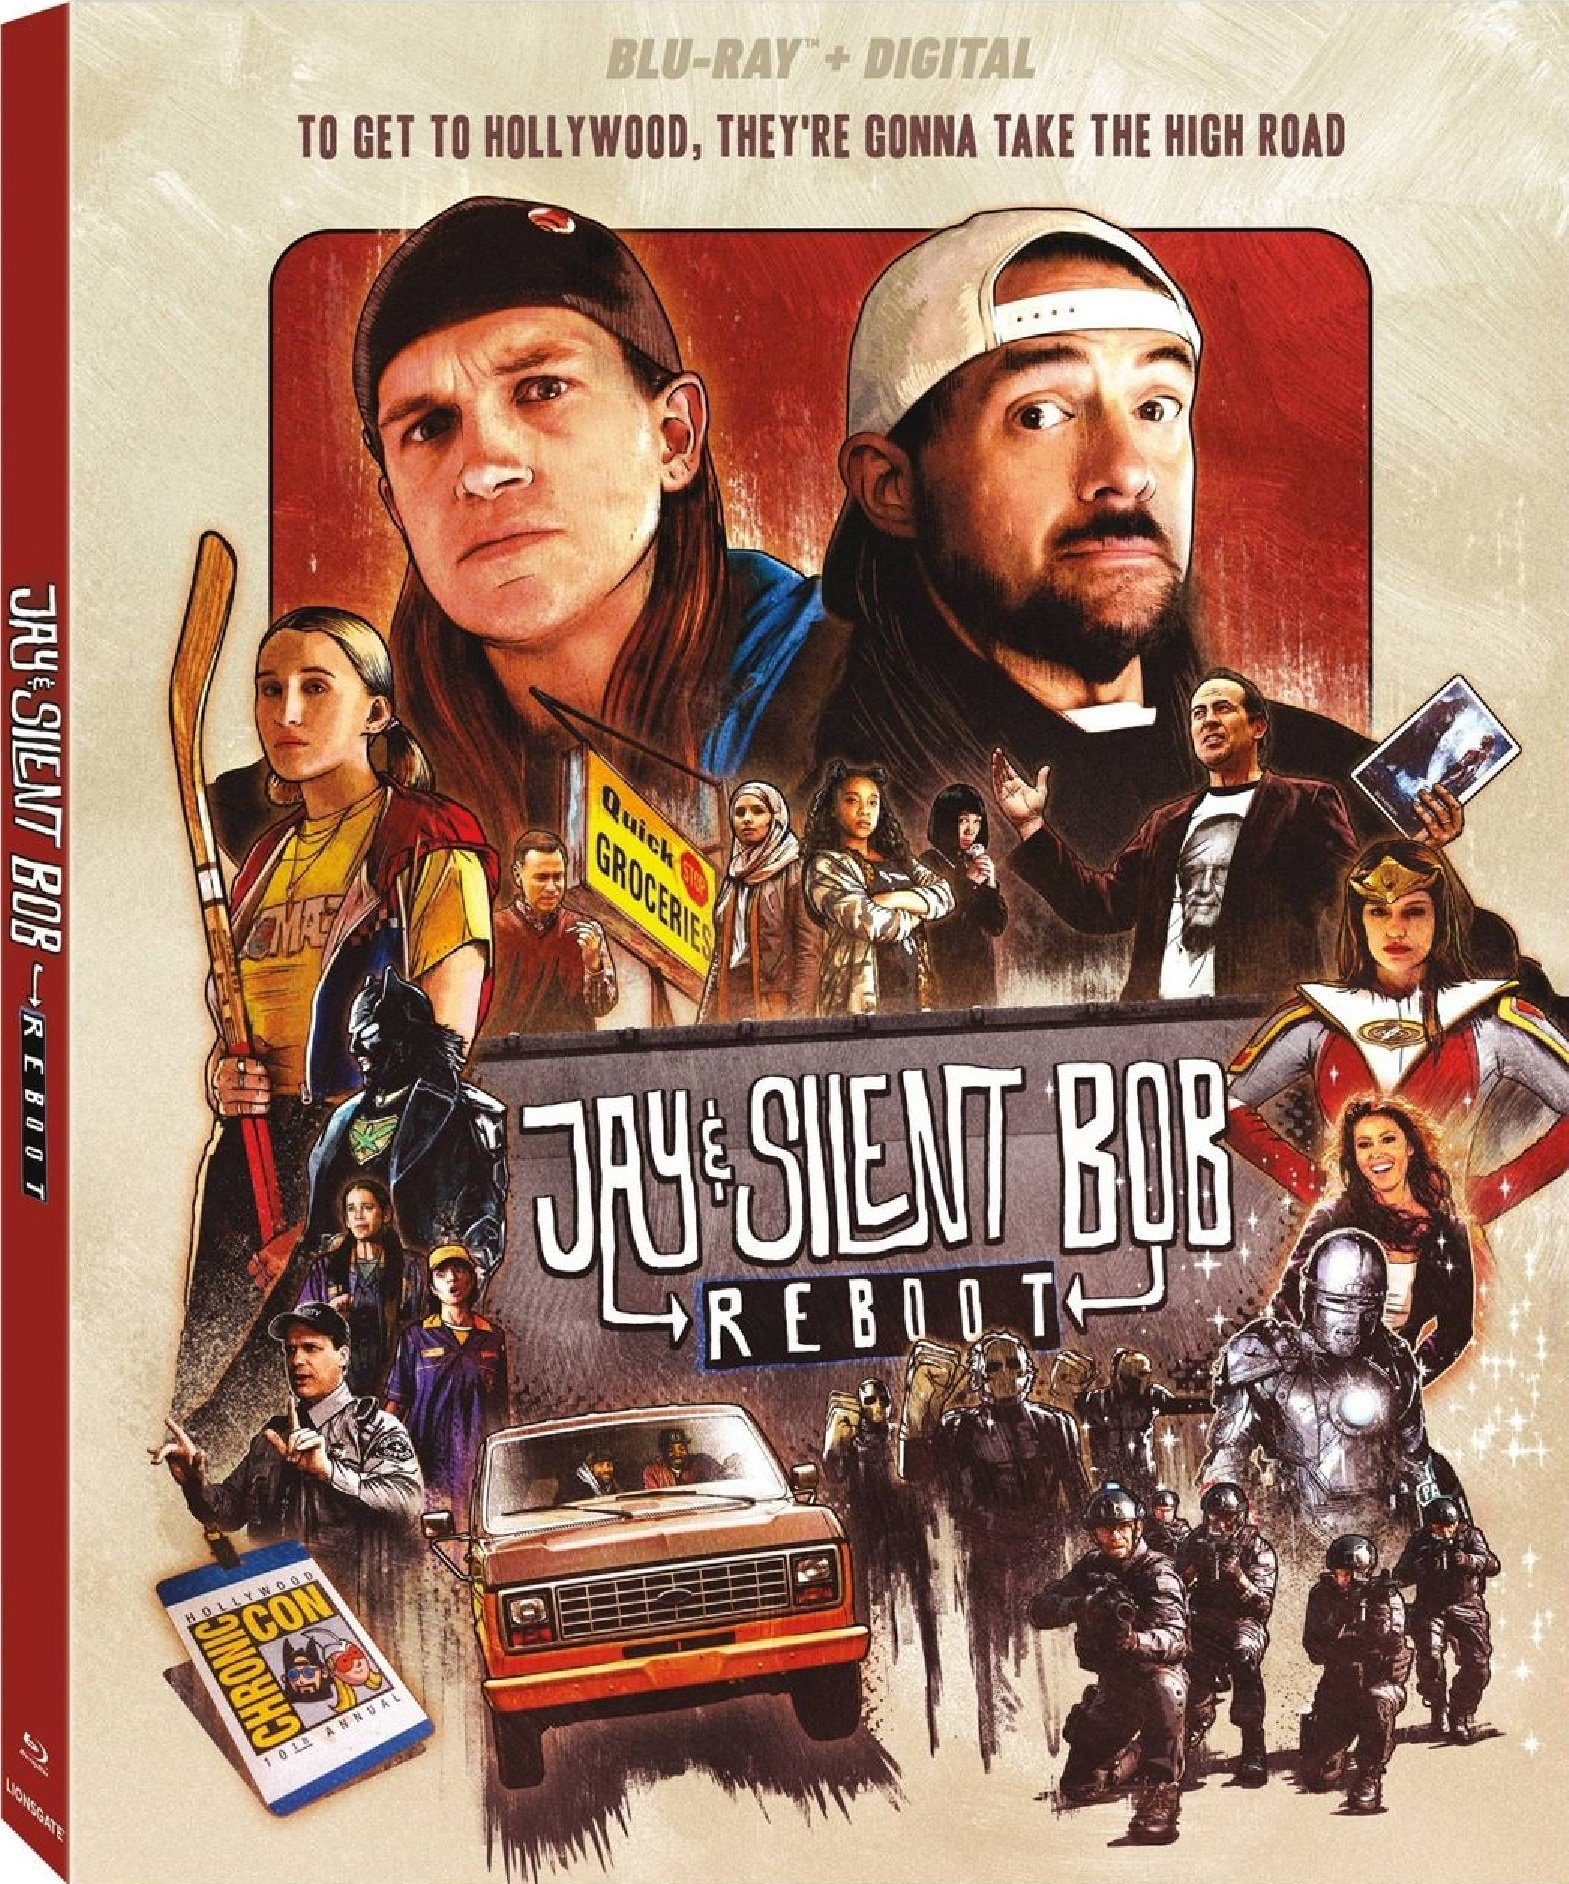 Jay and Silent Bob Reboot (2019) poster image